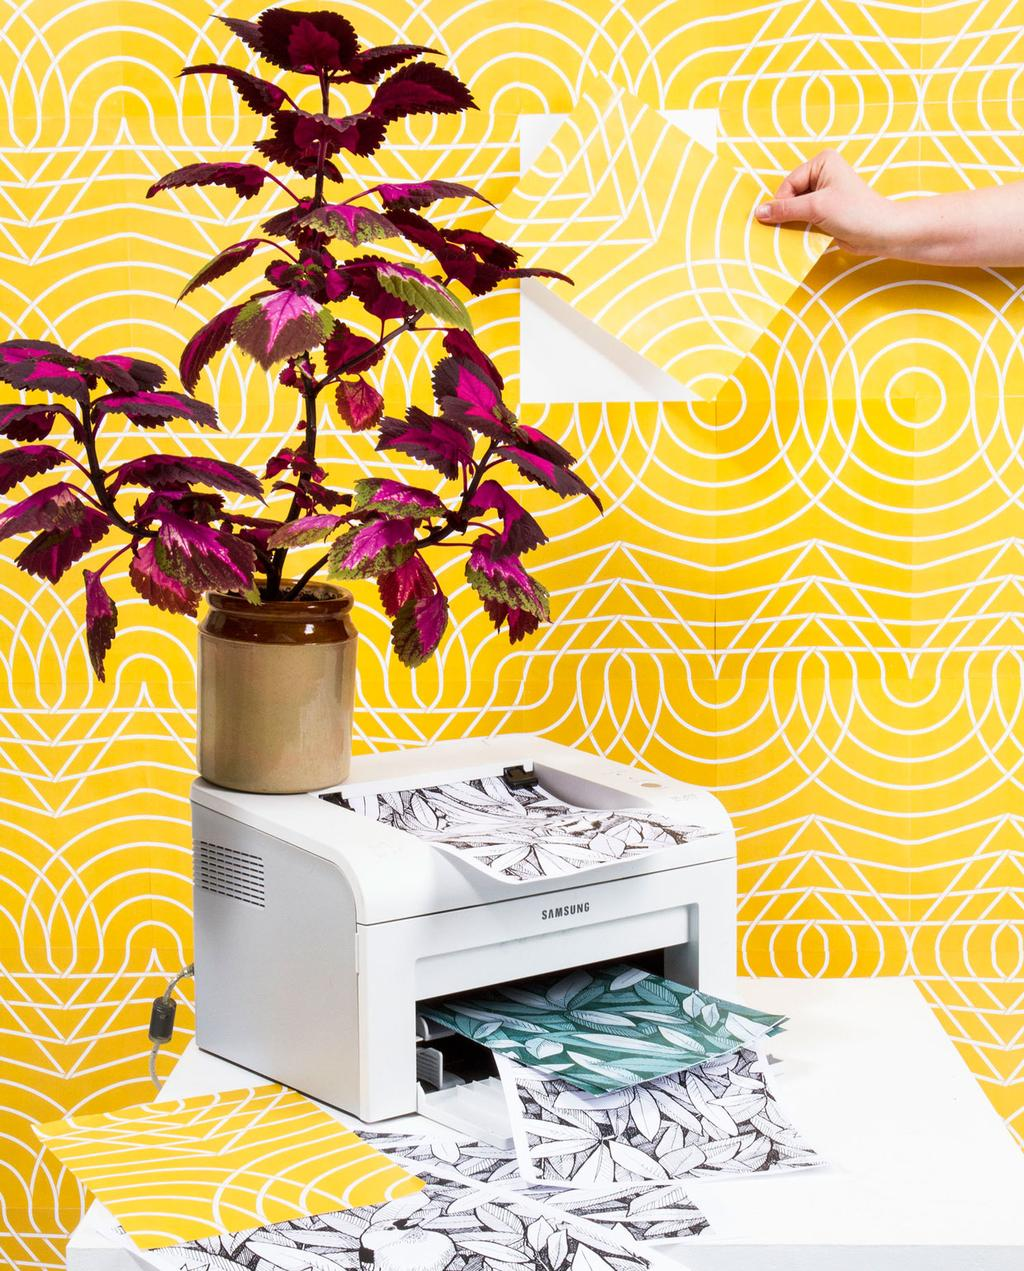 vtwonen | Blog StudentDesign Julia Groth behang kleurrijk